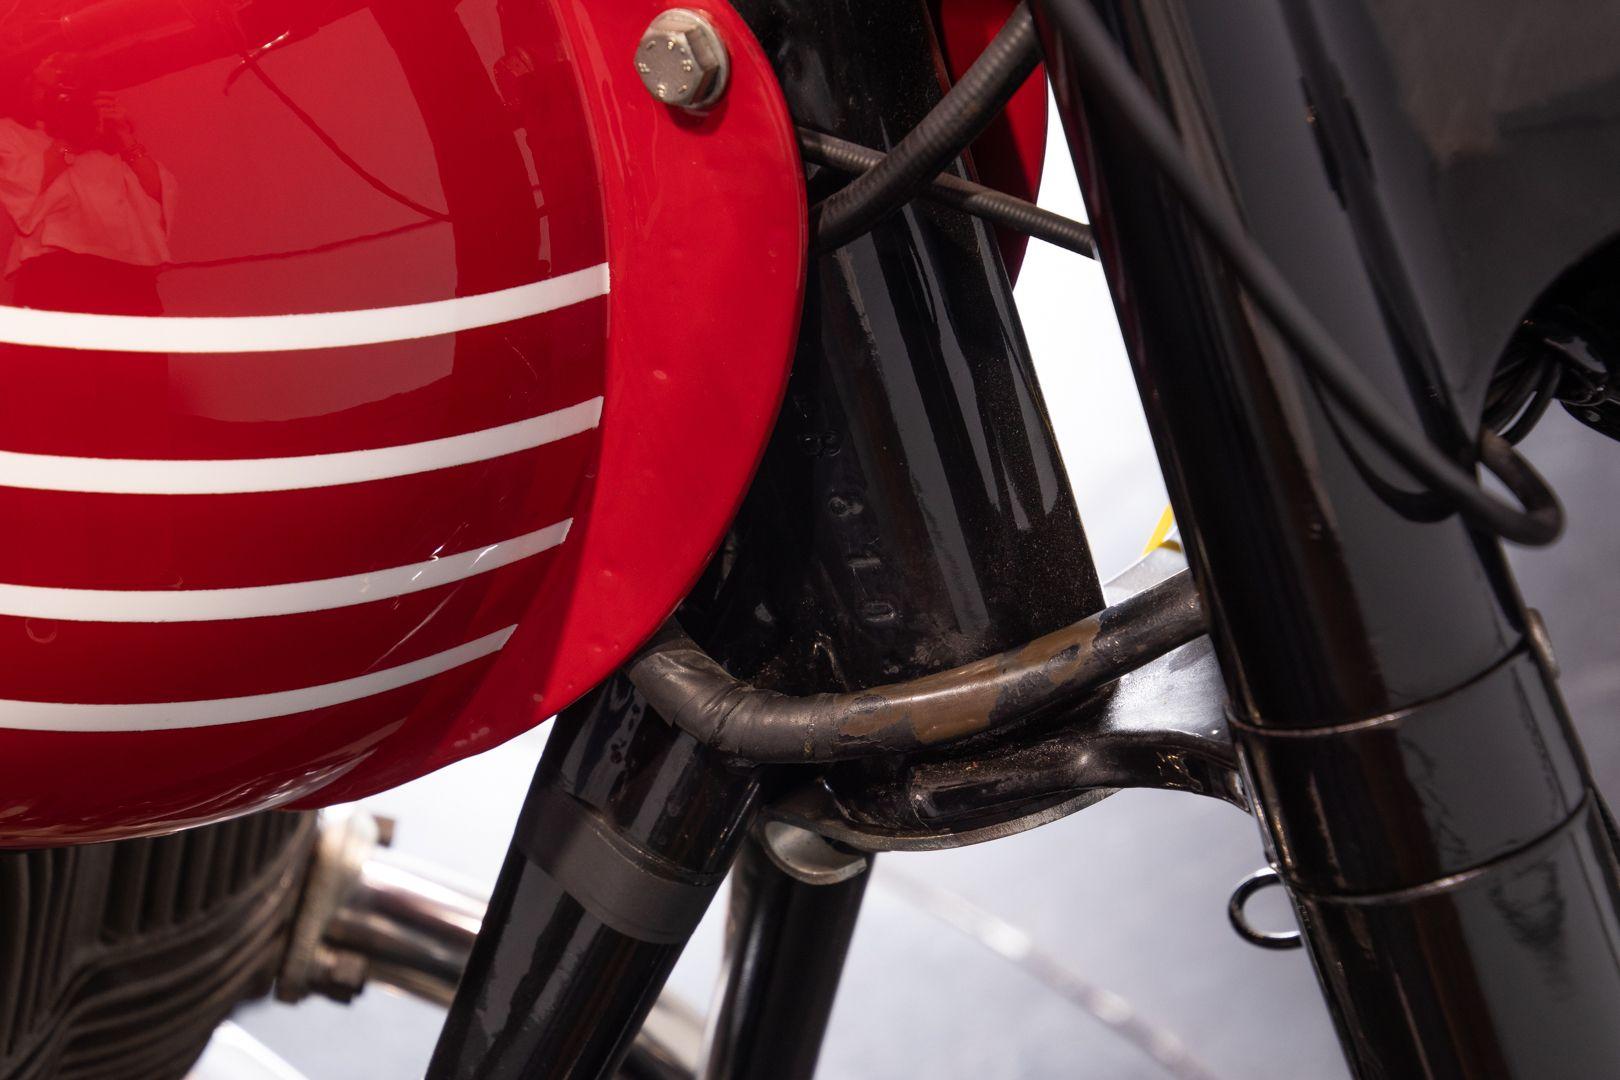 1955 Benelli 250 Leonessa 74317